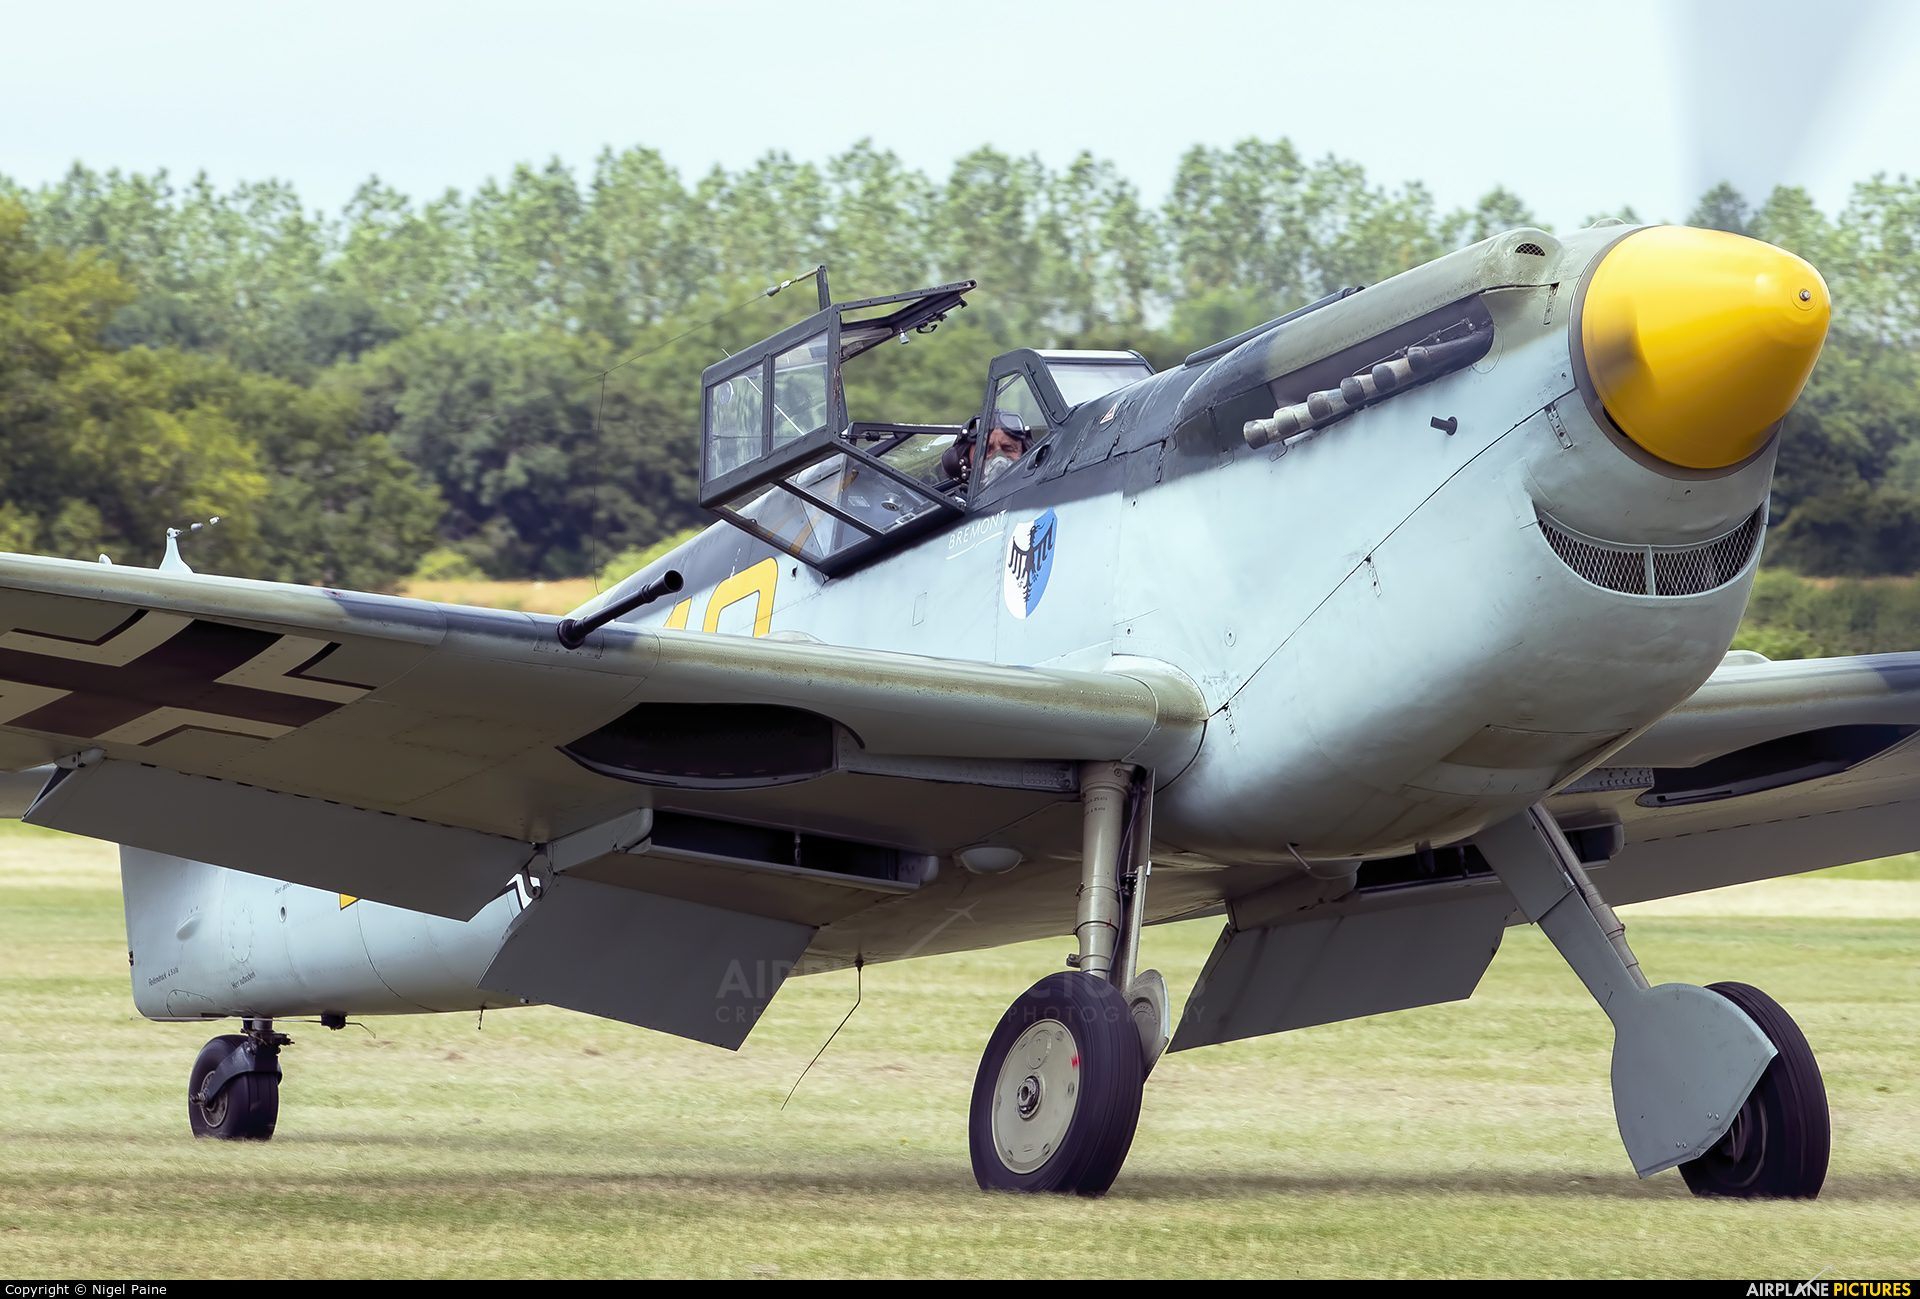 Private G-AWHK aircraft at Lashenden / Headcorn